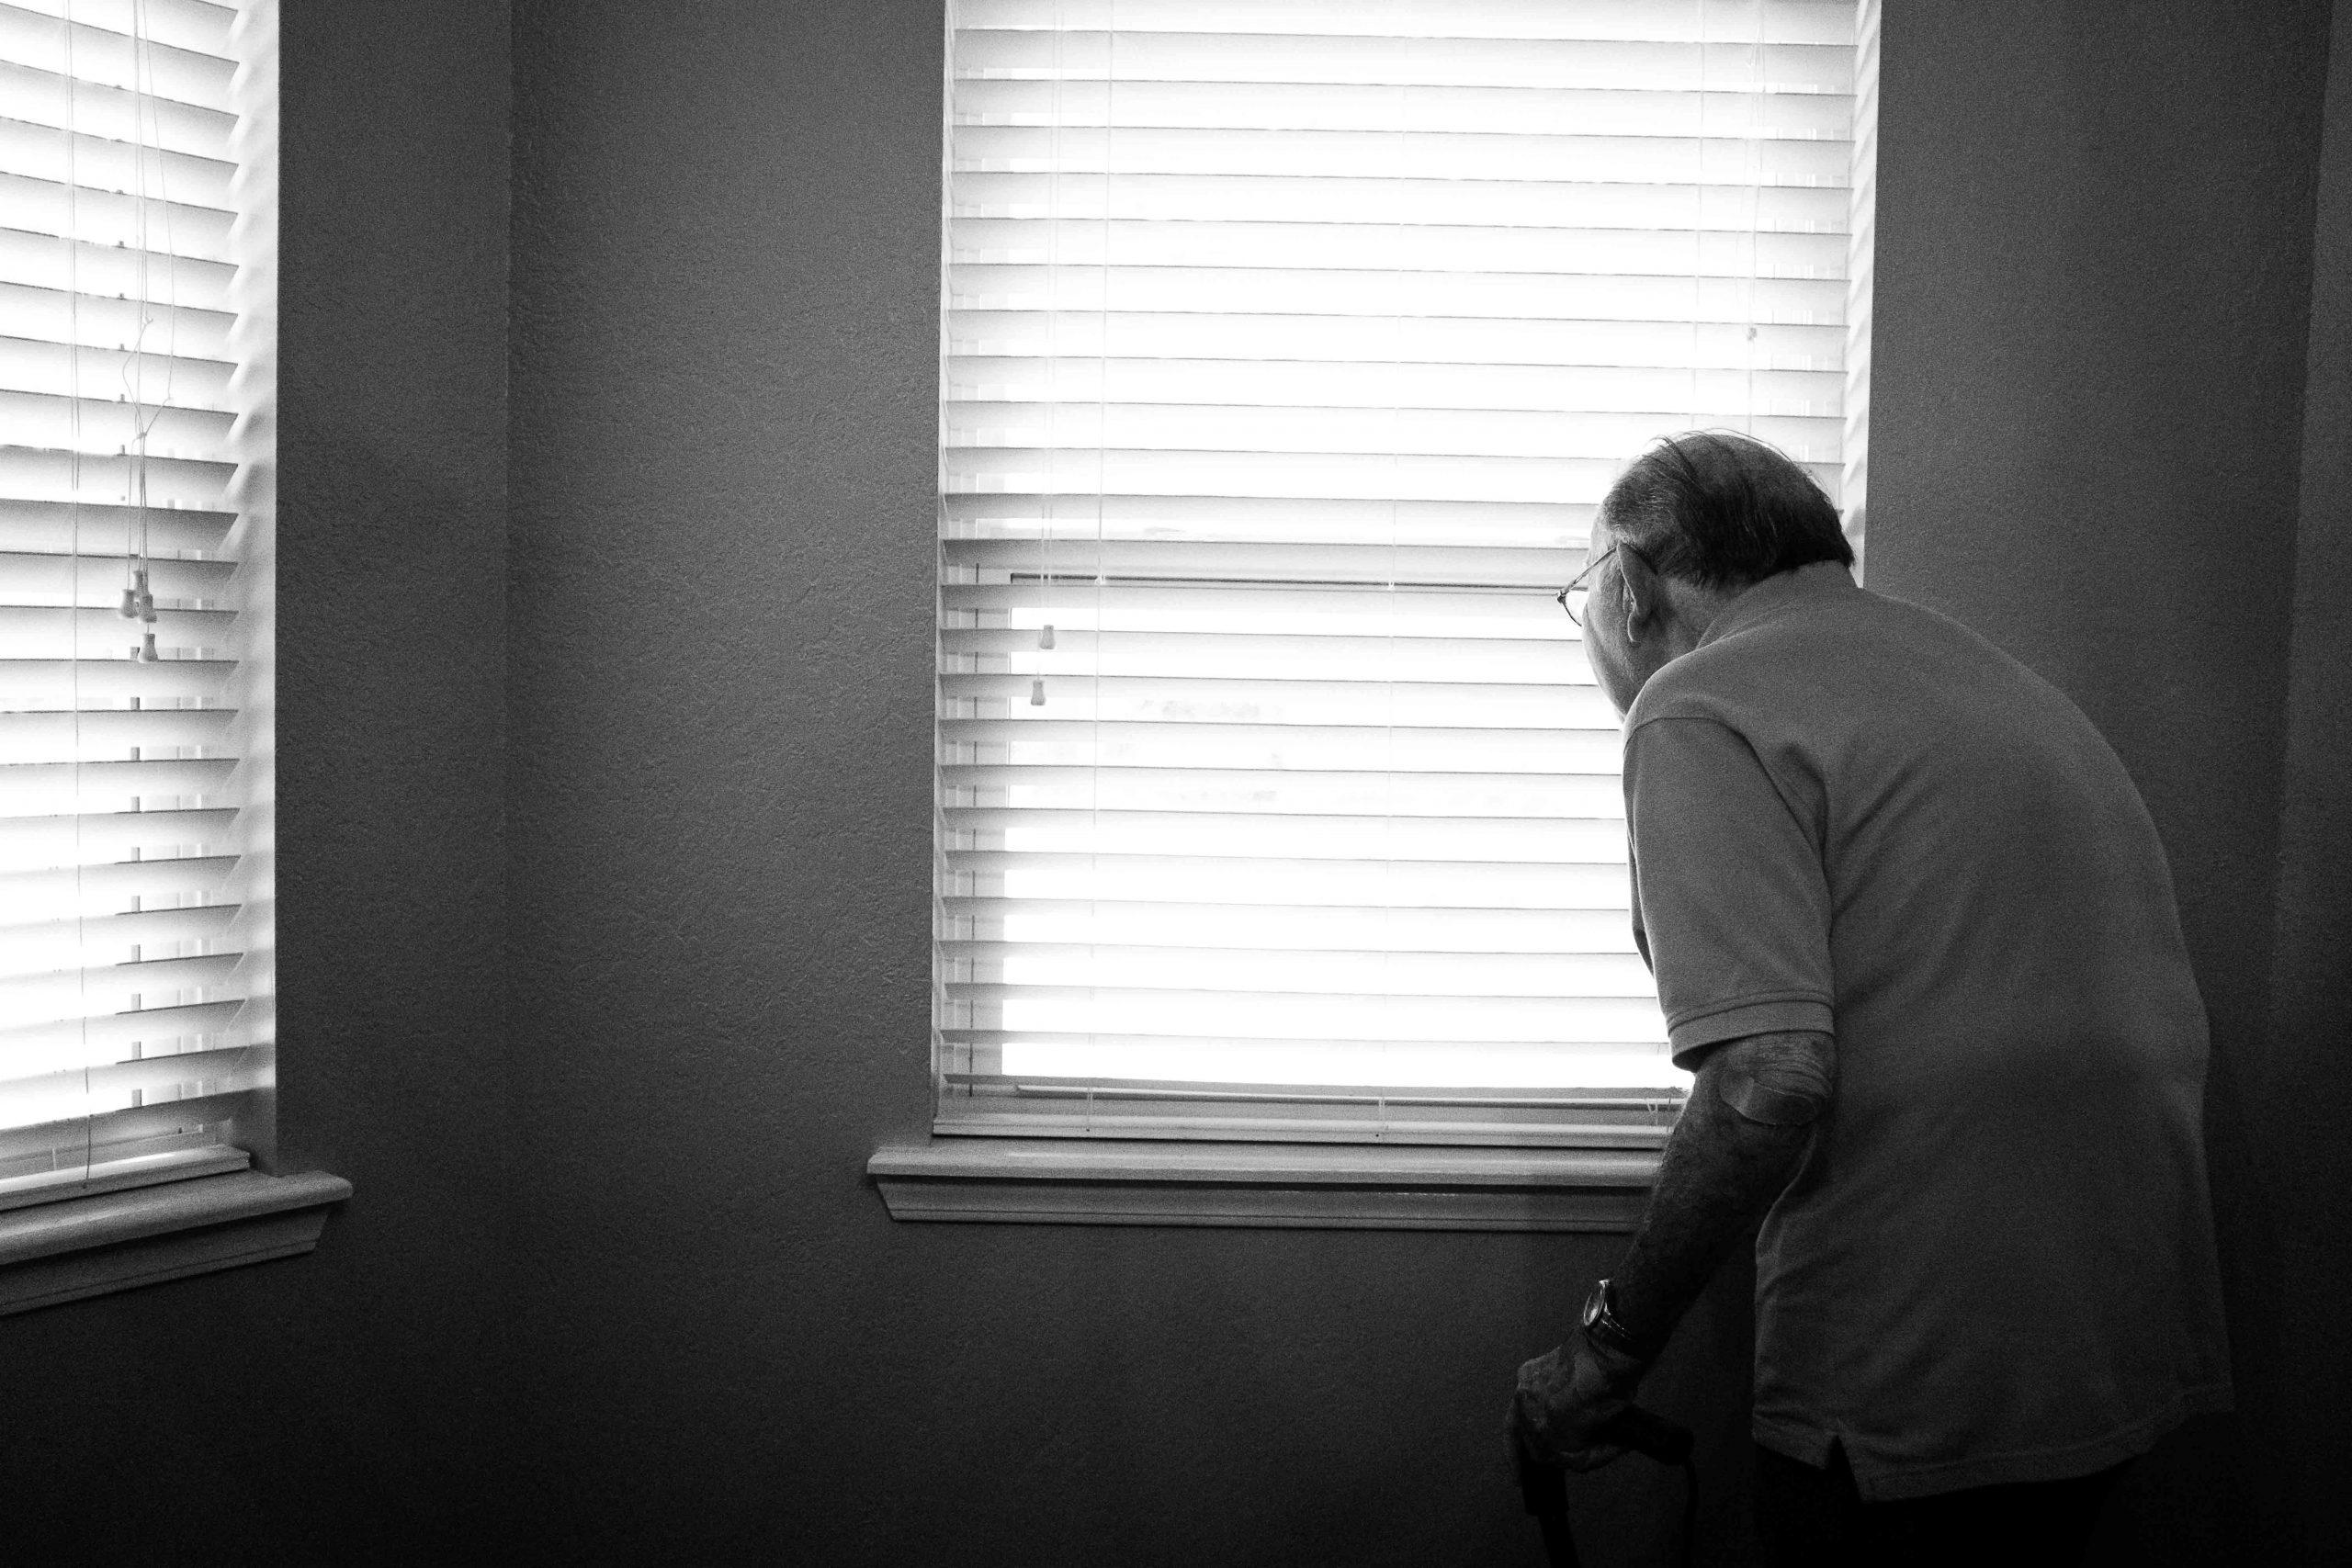 Elderly person looking outside